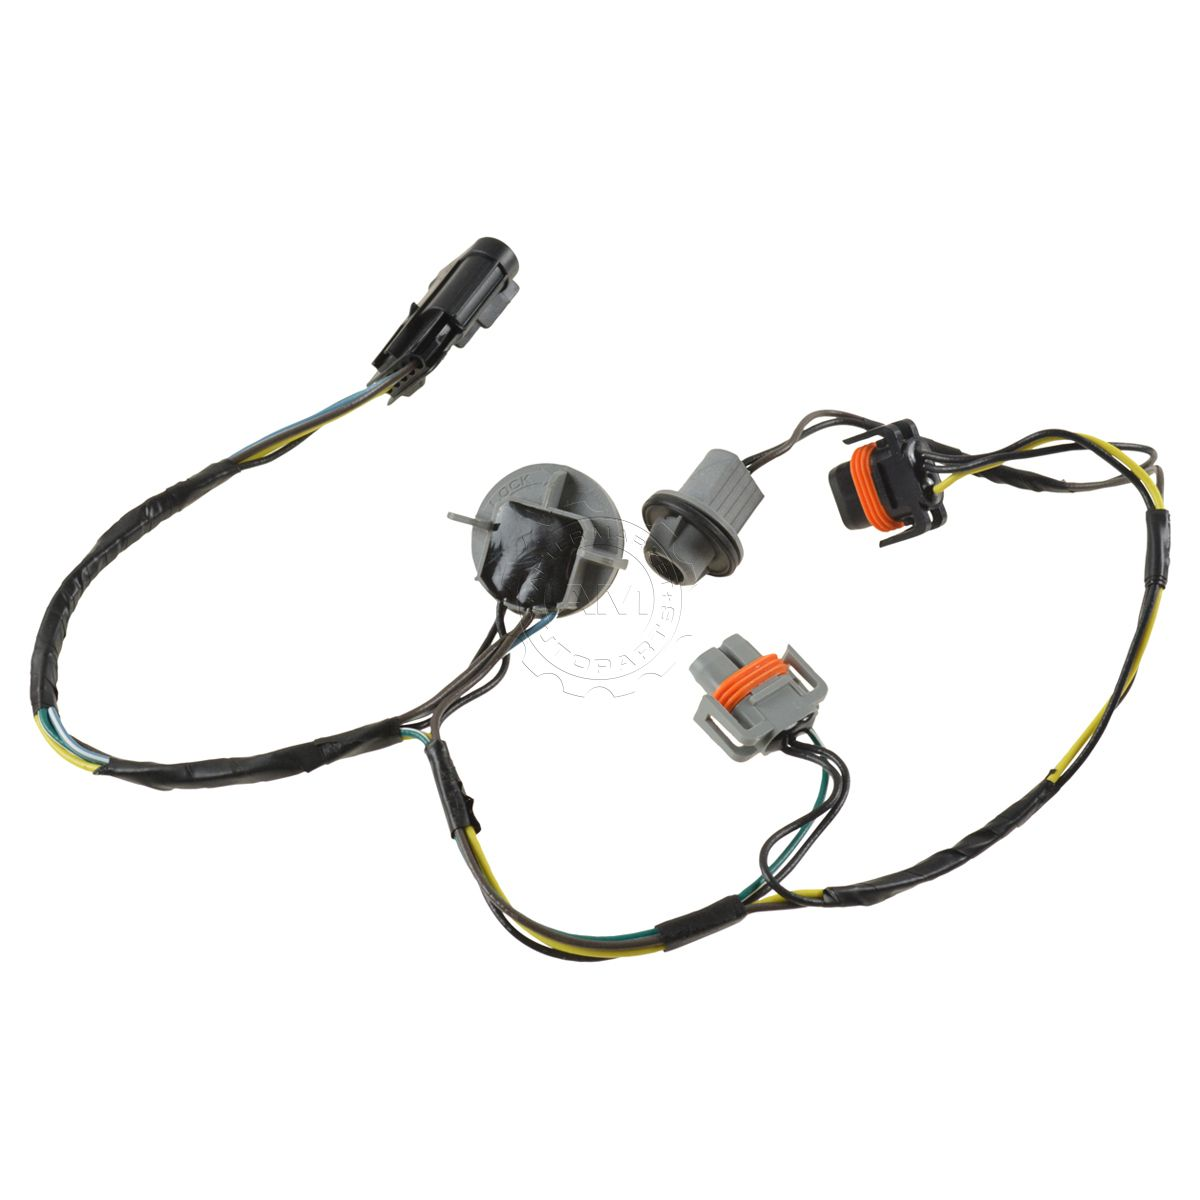 oem 15930264 headlight wiring harness lh or rh side for 08-12 chevy malibu  new